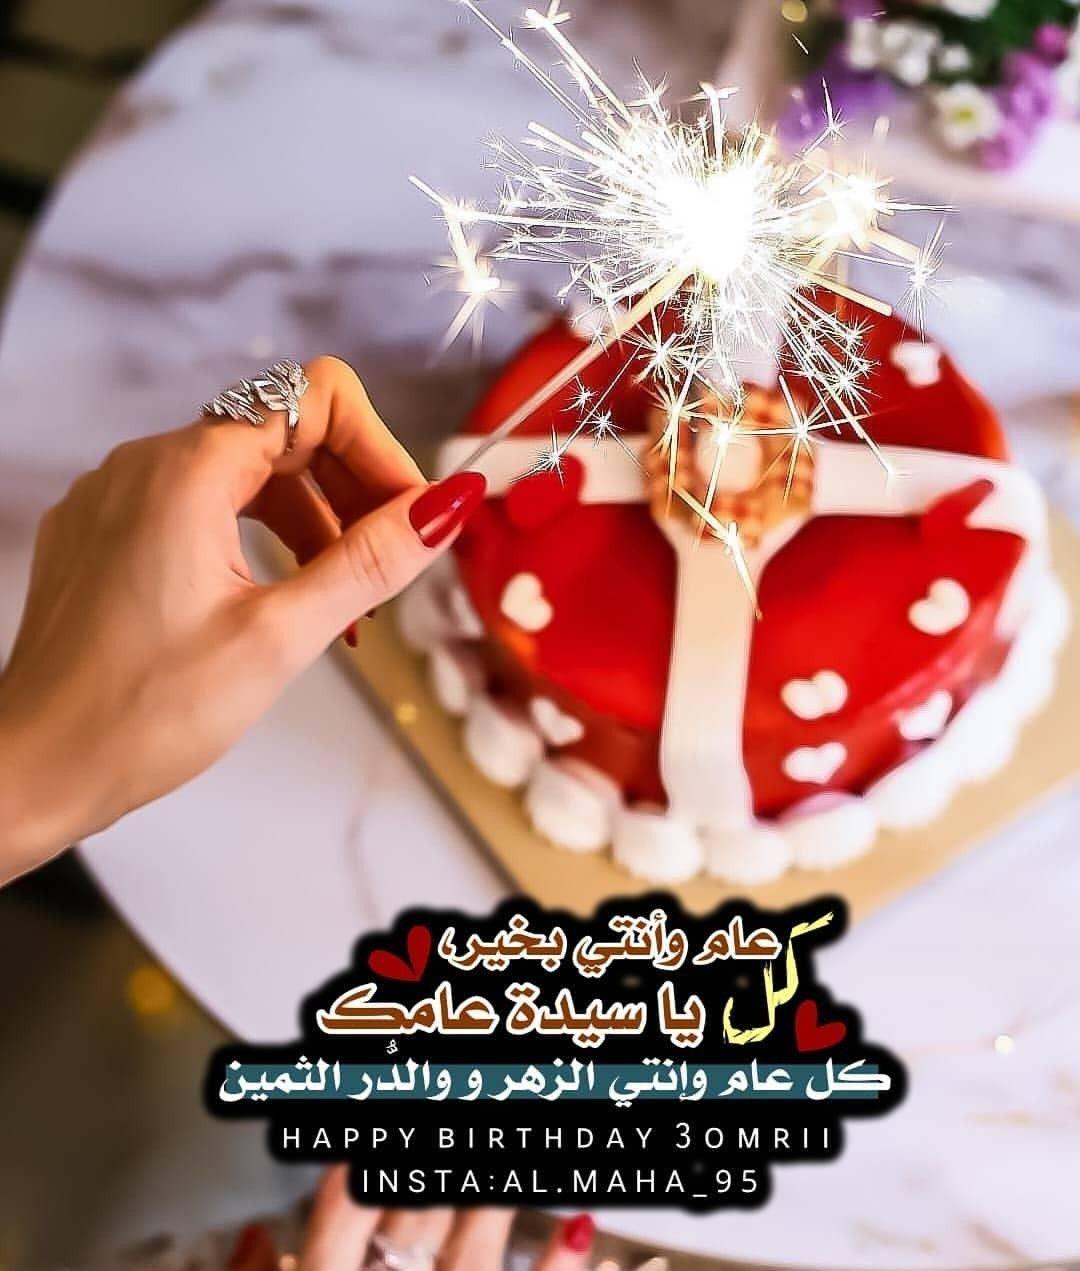 Pin By سيدة الالقاب On Happy Eid Birthday Qoutes Bridal Shower Cupcakes Happy Eid